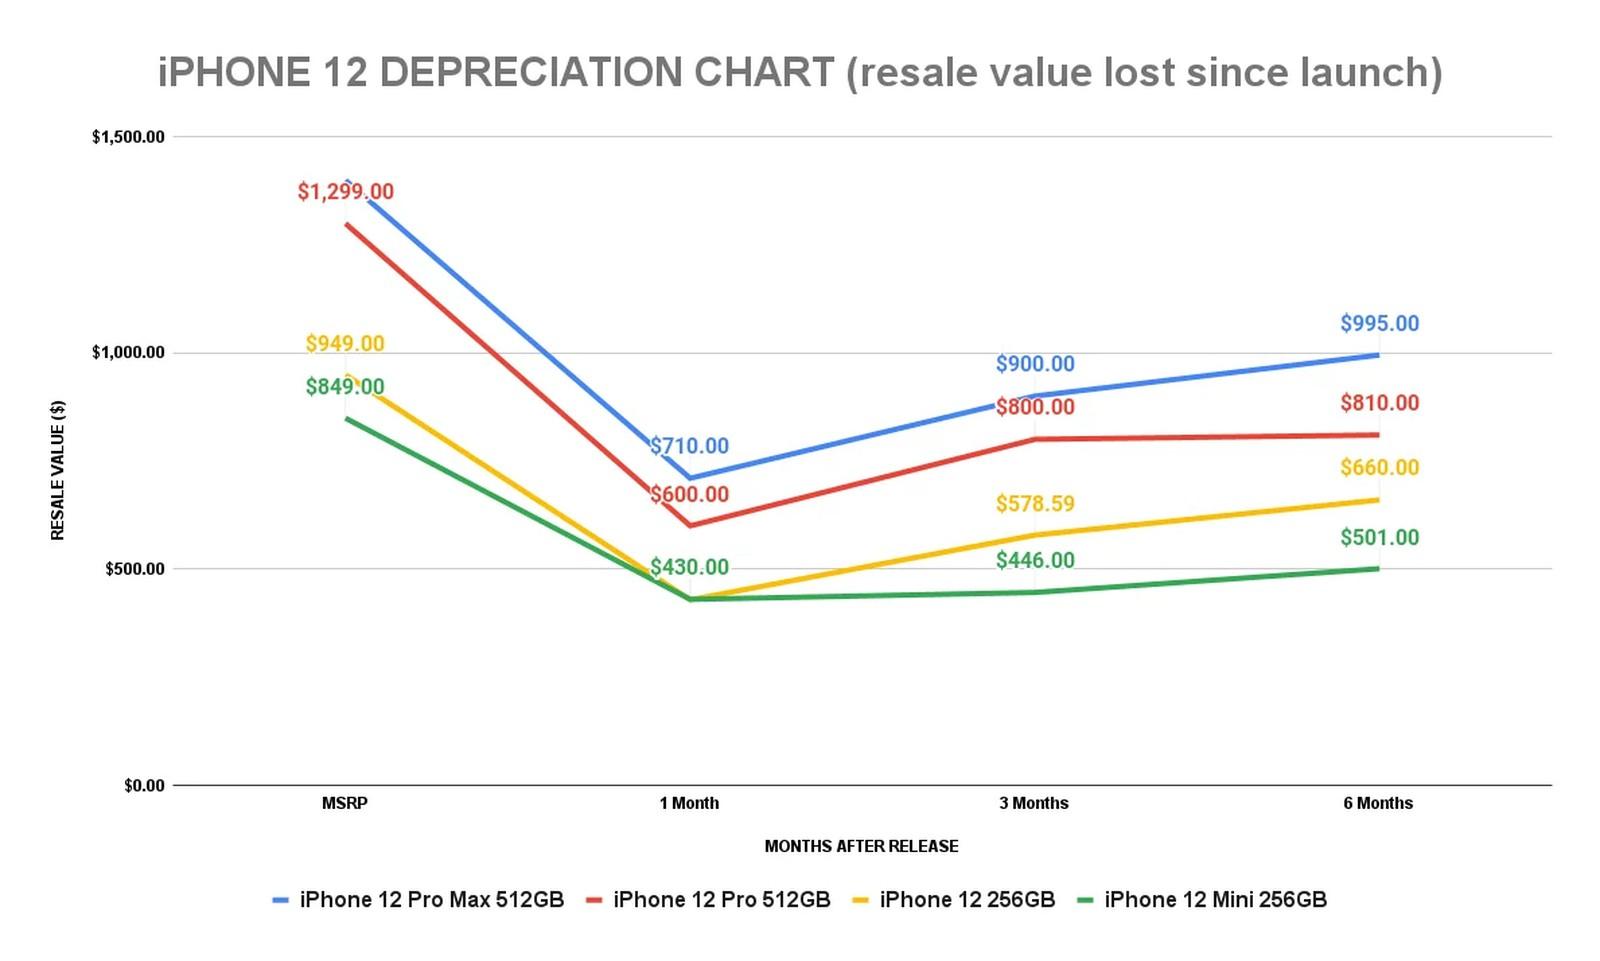 iPhone 12 waarde ontwikkeling